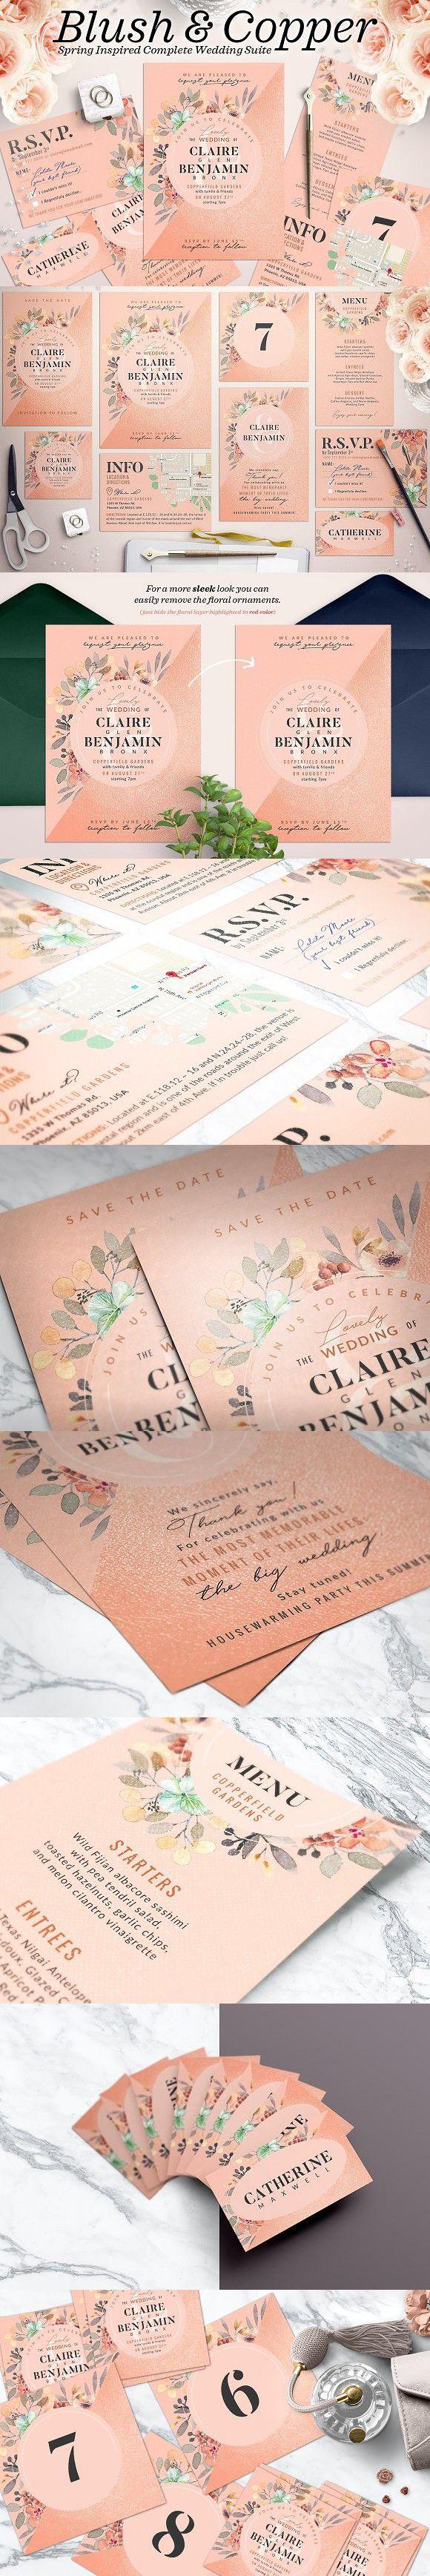 wedding card backgrounds vectors%0A Wedding Suite IX  Blush Copper  Wedding Card Templates